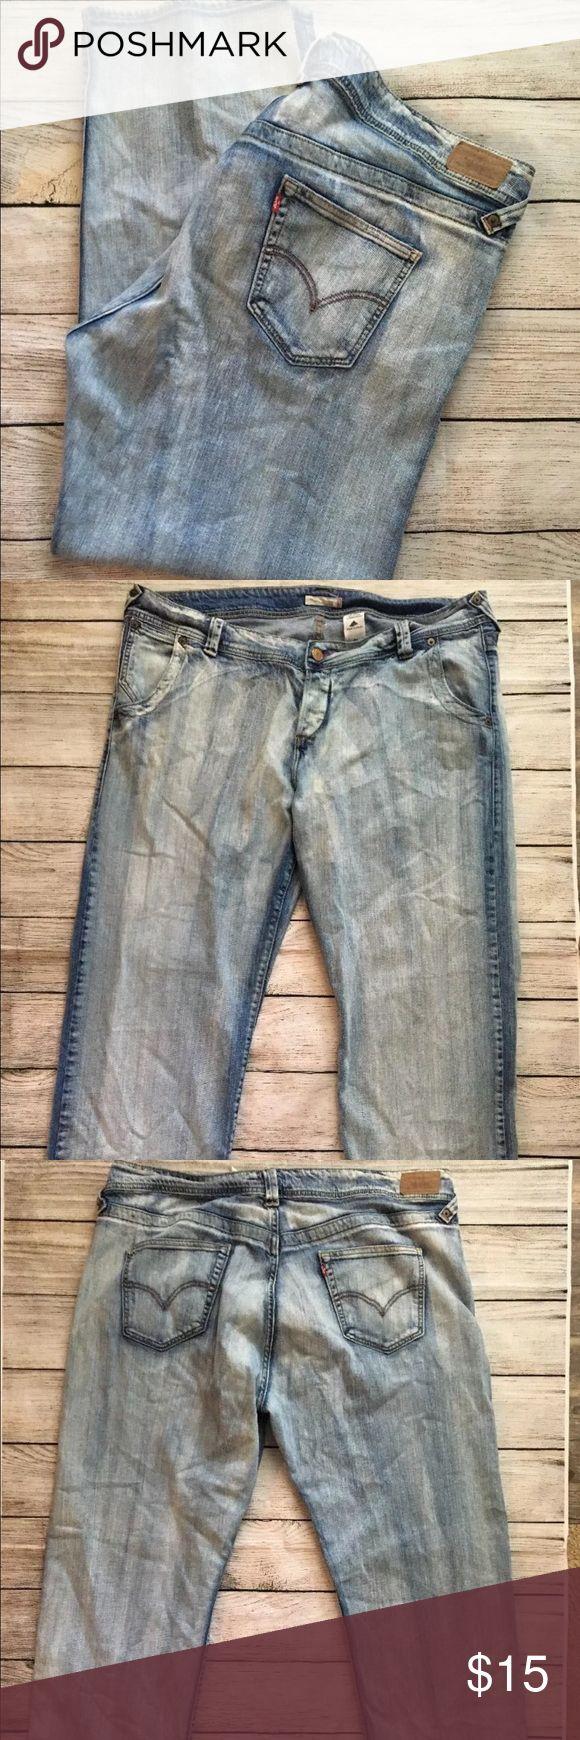 Levi's 513 Slouch Jeans 22 Boot Cut Stretch Levi's 513 Slouch Jeans 22 Boot Cut Low Button Fly Stretch Distressed Grunge Levi's Jeans Boot Cut